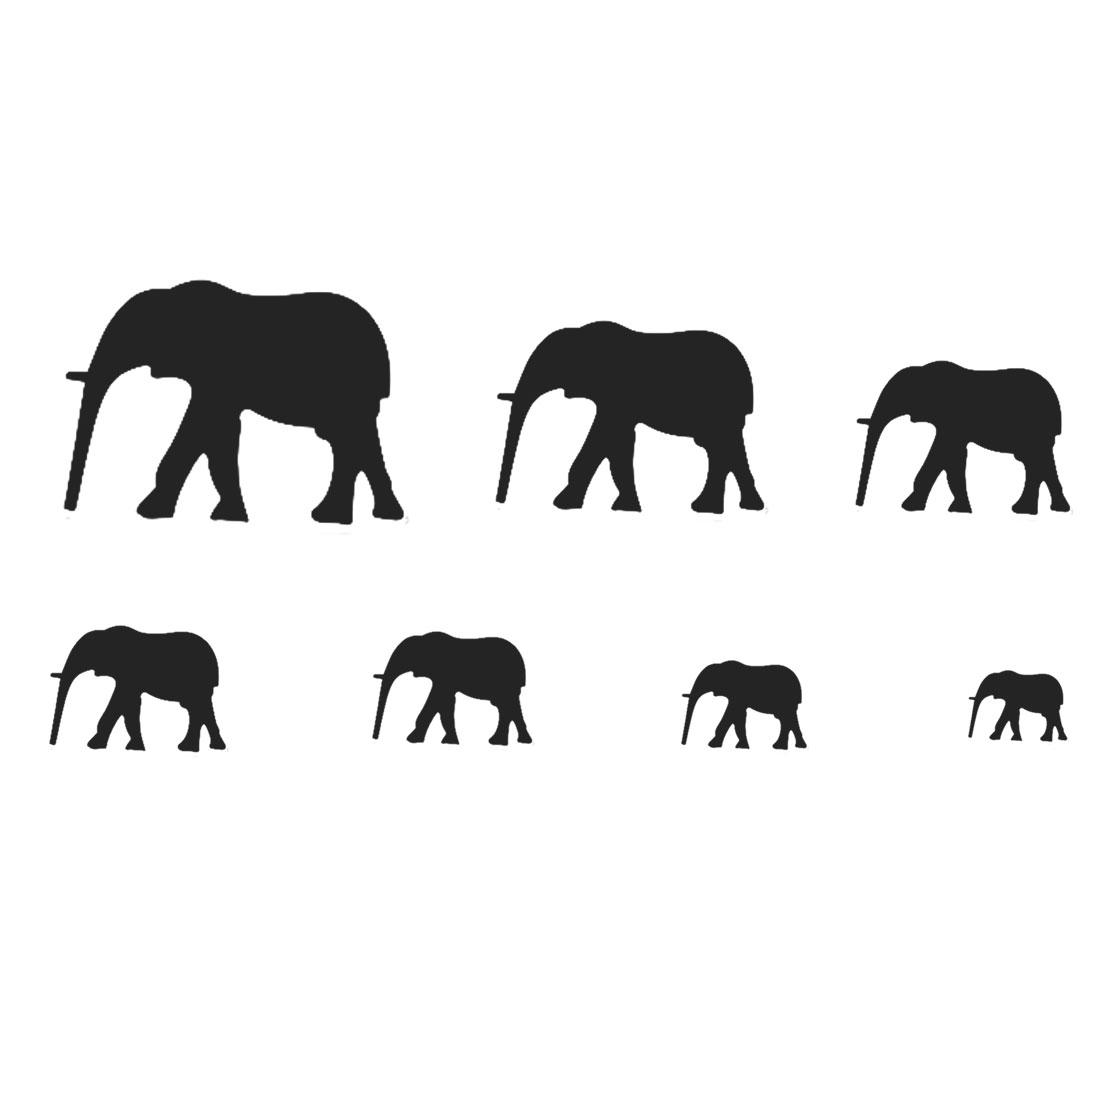 Home Acrylic Elephant Pattern Self-adhesive Protector Mirror Wall Sticker Black